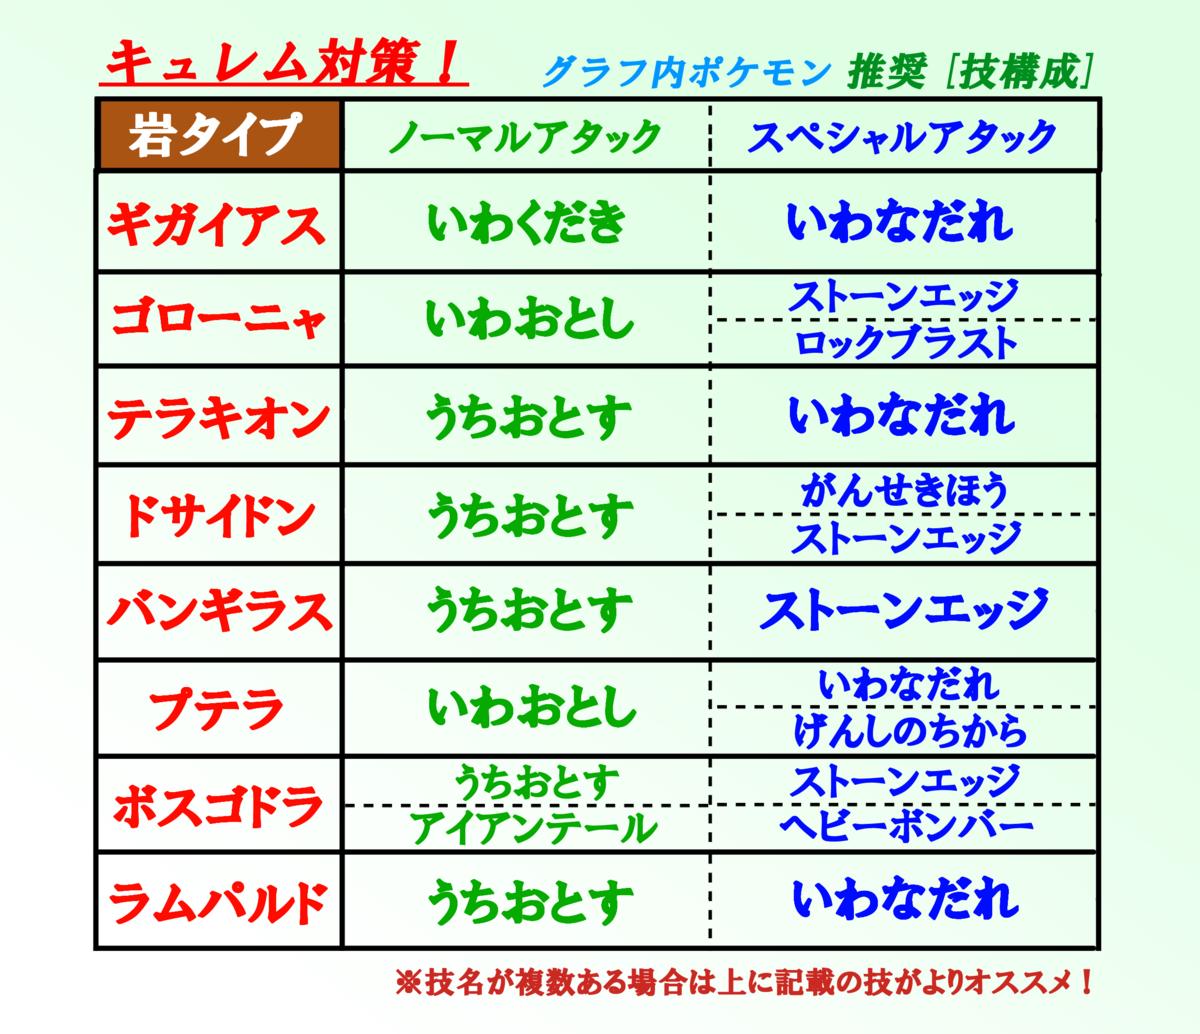 f:id:Kazumin0331:20200703003844p:plain